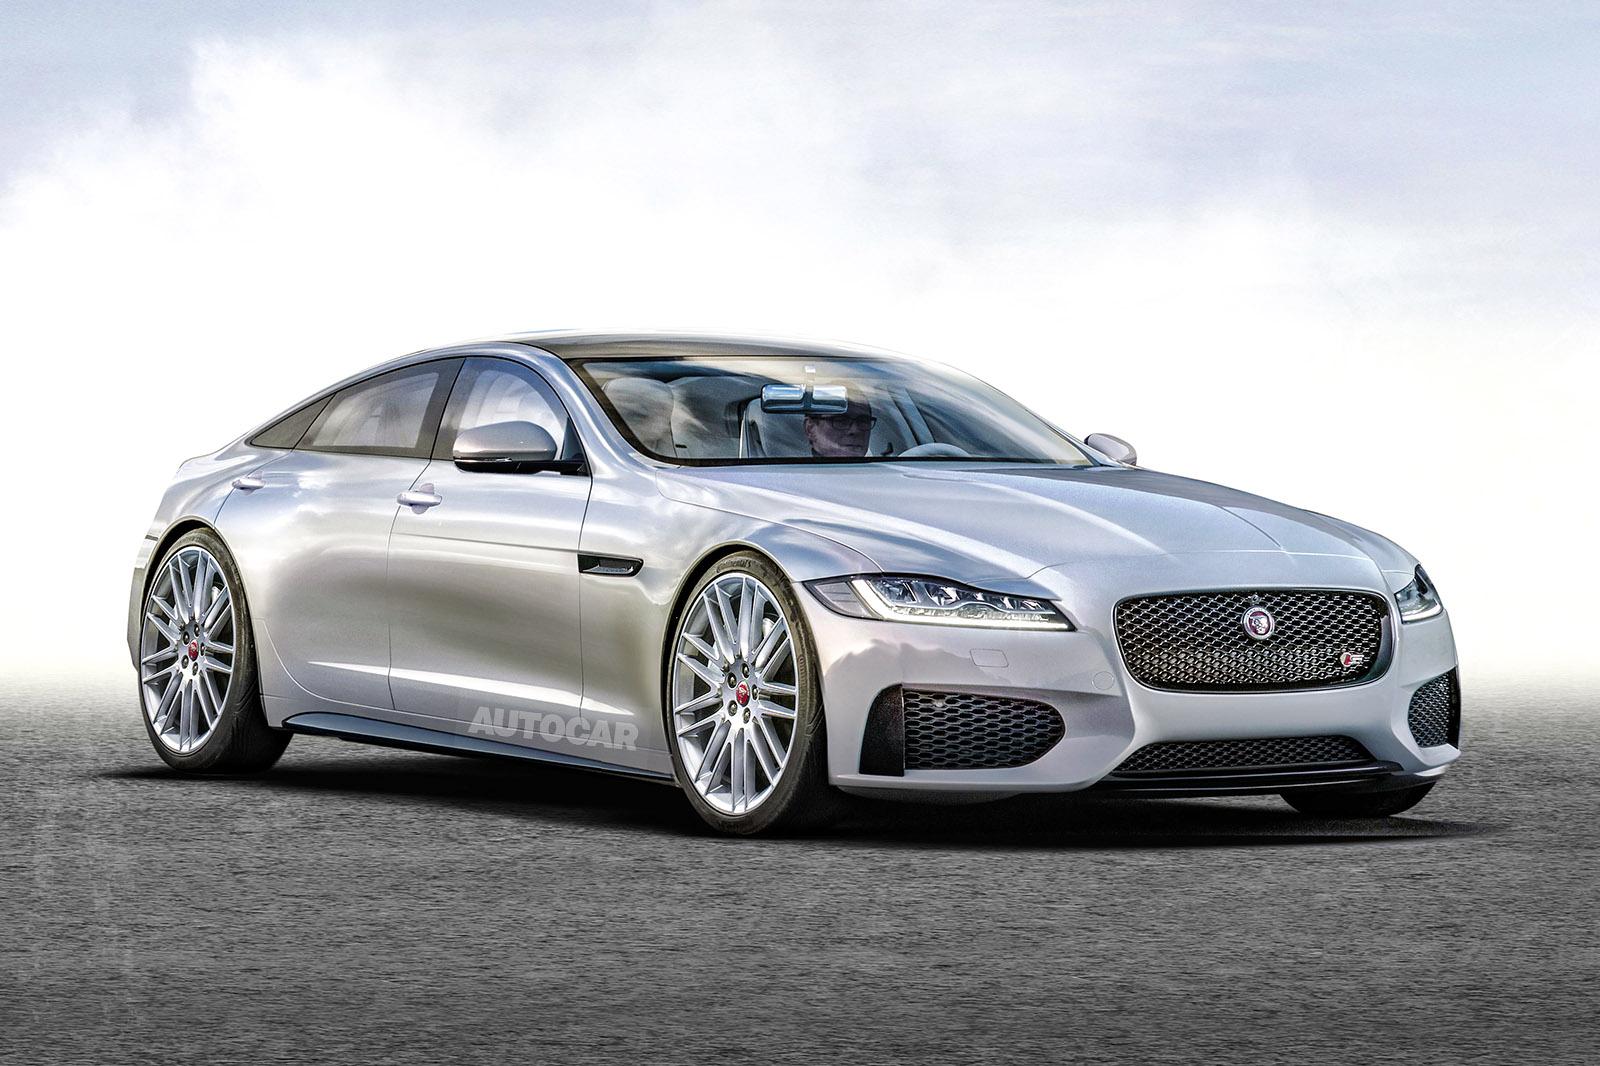 2017 jaguar xj review redesign price 2017 2018 car reviews - 2019 Jaguar Xj Stunning Outside Luxurious Inside Ian Callum Autocar